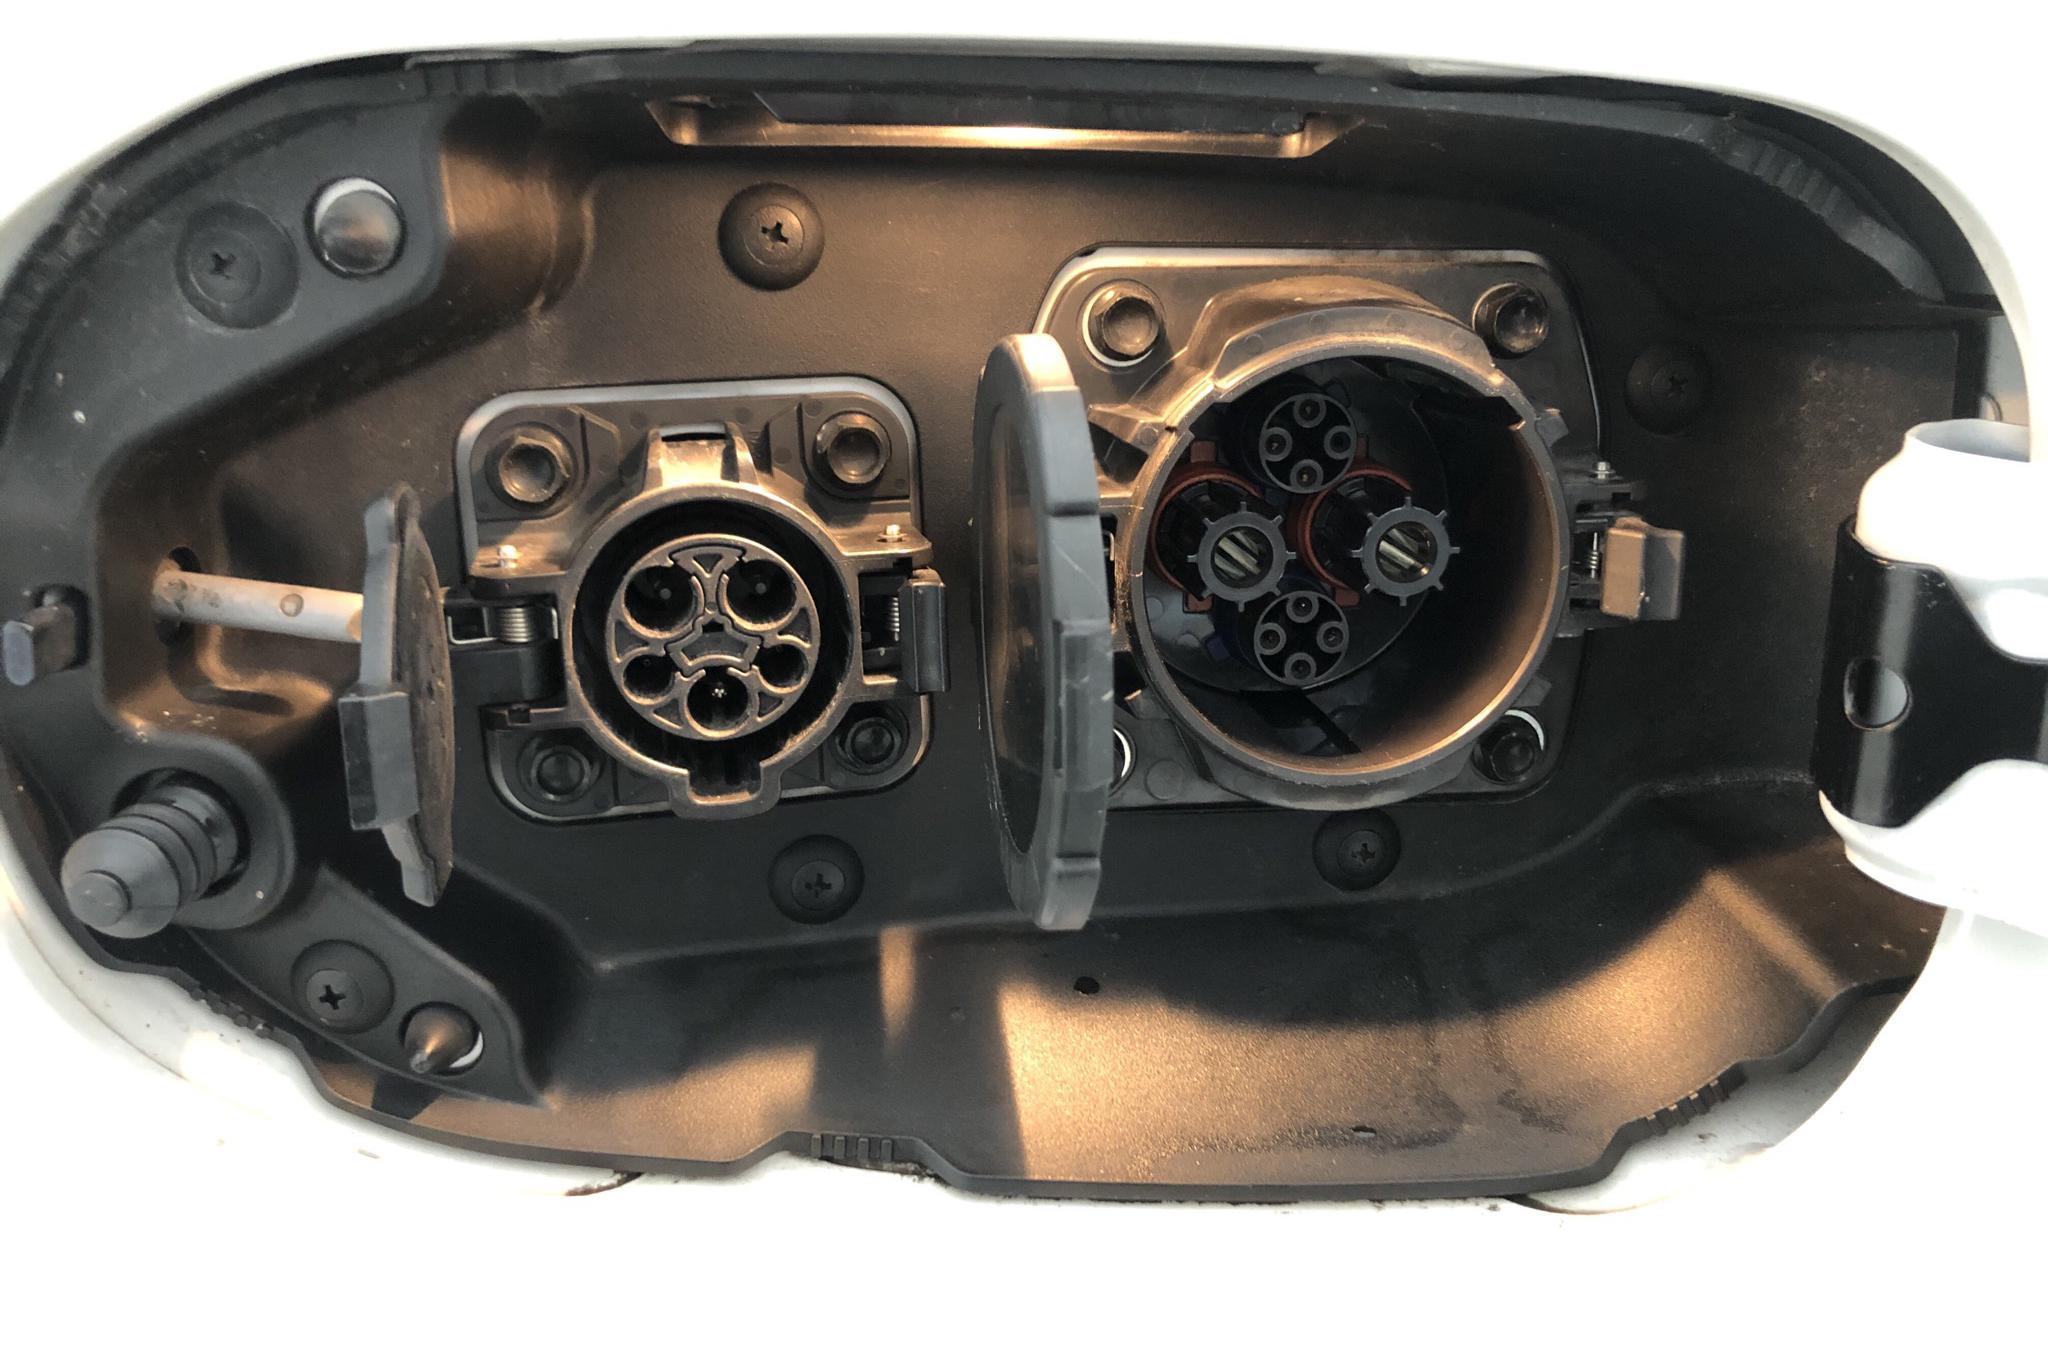 Mitsubishi Outlander 2.0 Plug-in Hybrid 4WD (121hk) - 5 496 mil - Automat - vit - 2014